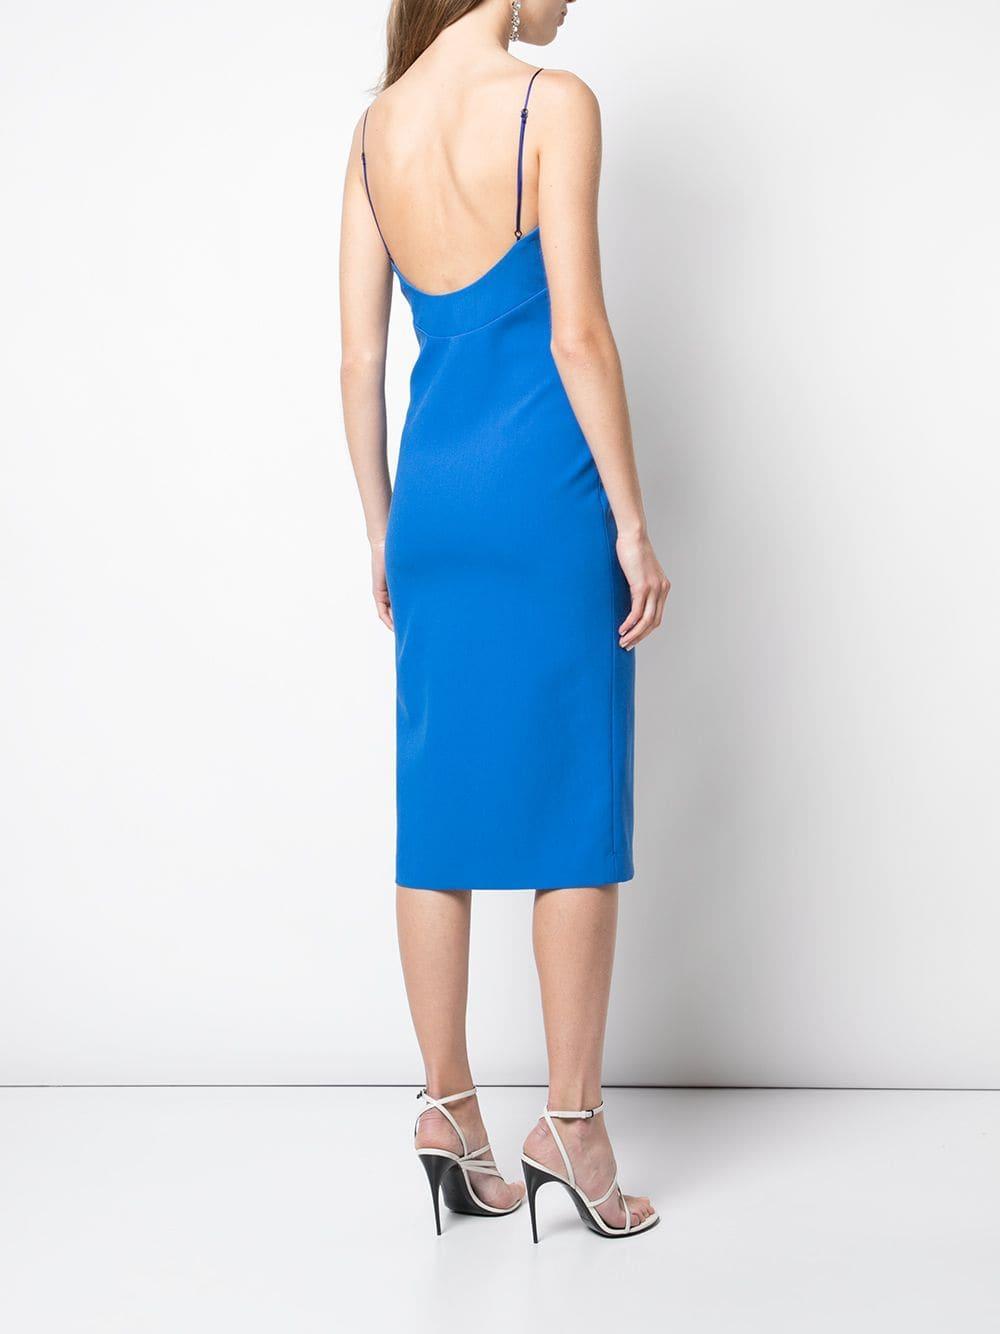 Olivia dress Synthétique Haney en coloris Bleu